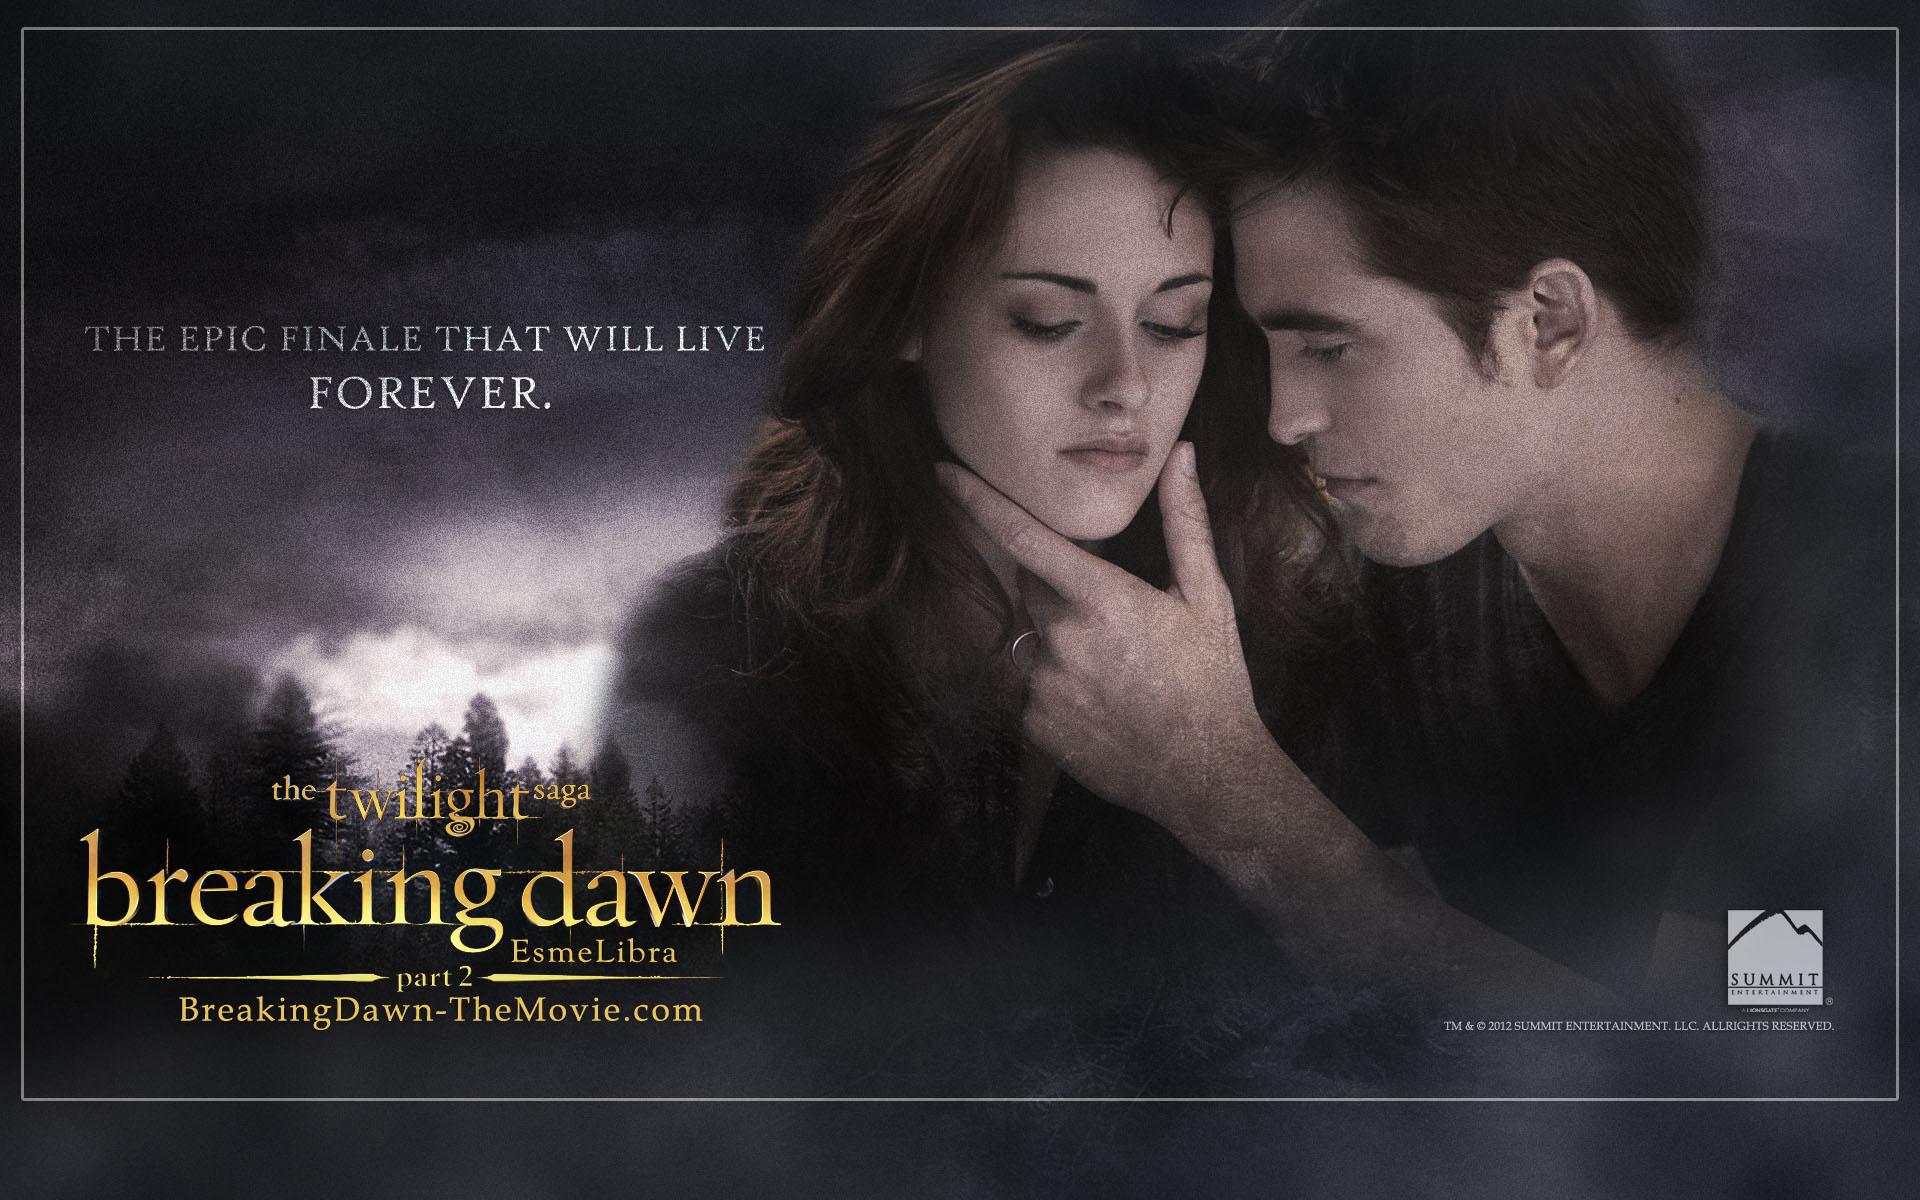 Twilight Series Breaking Dawn Part 2 Wallpaper